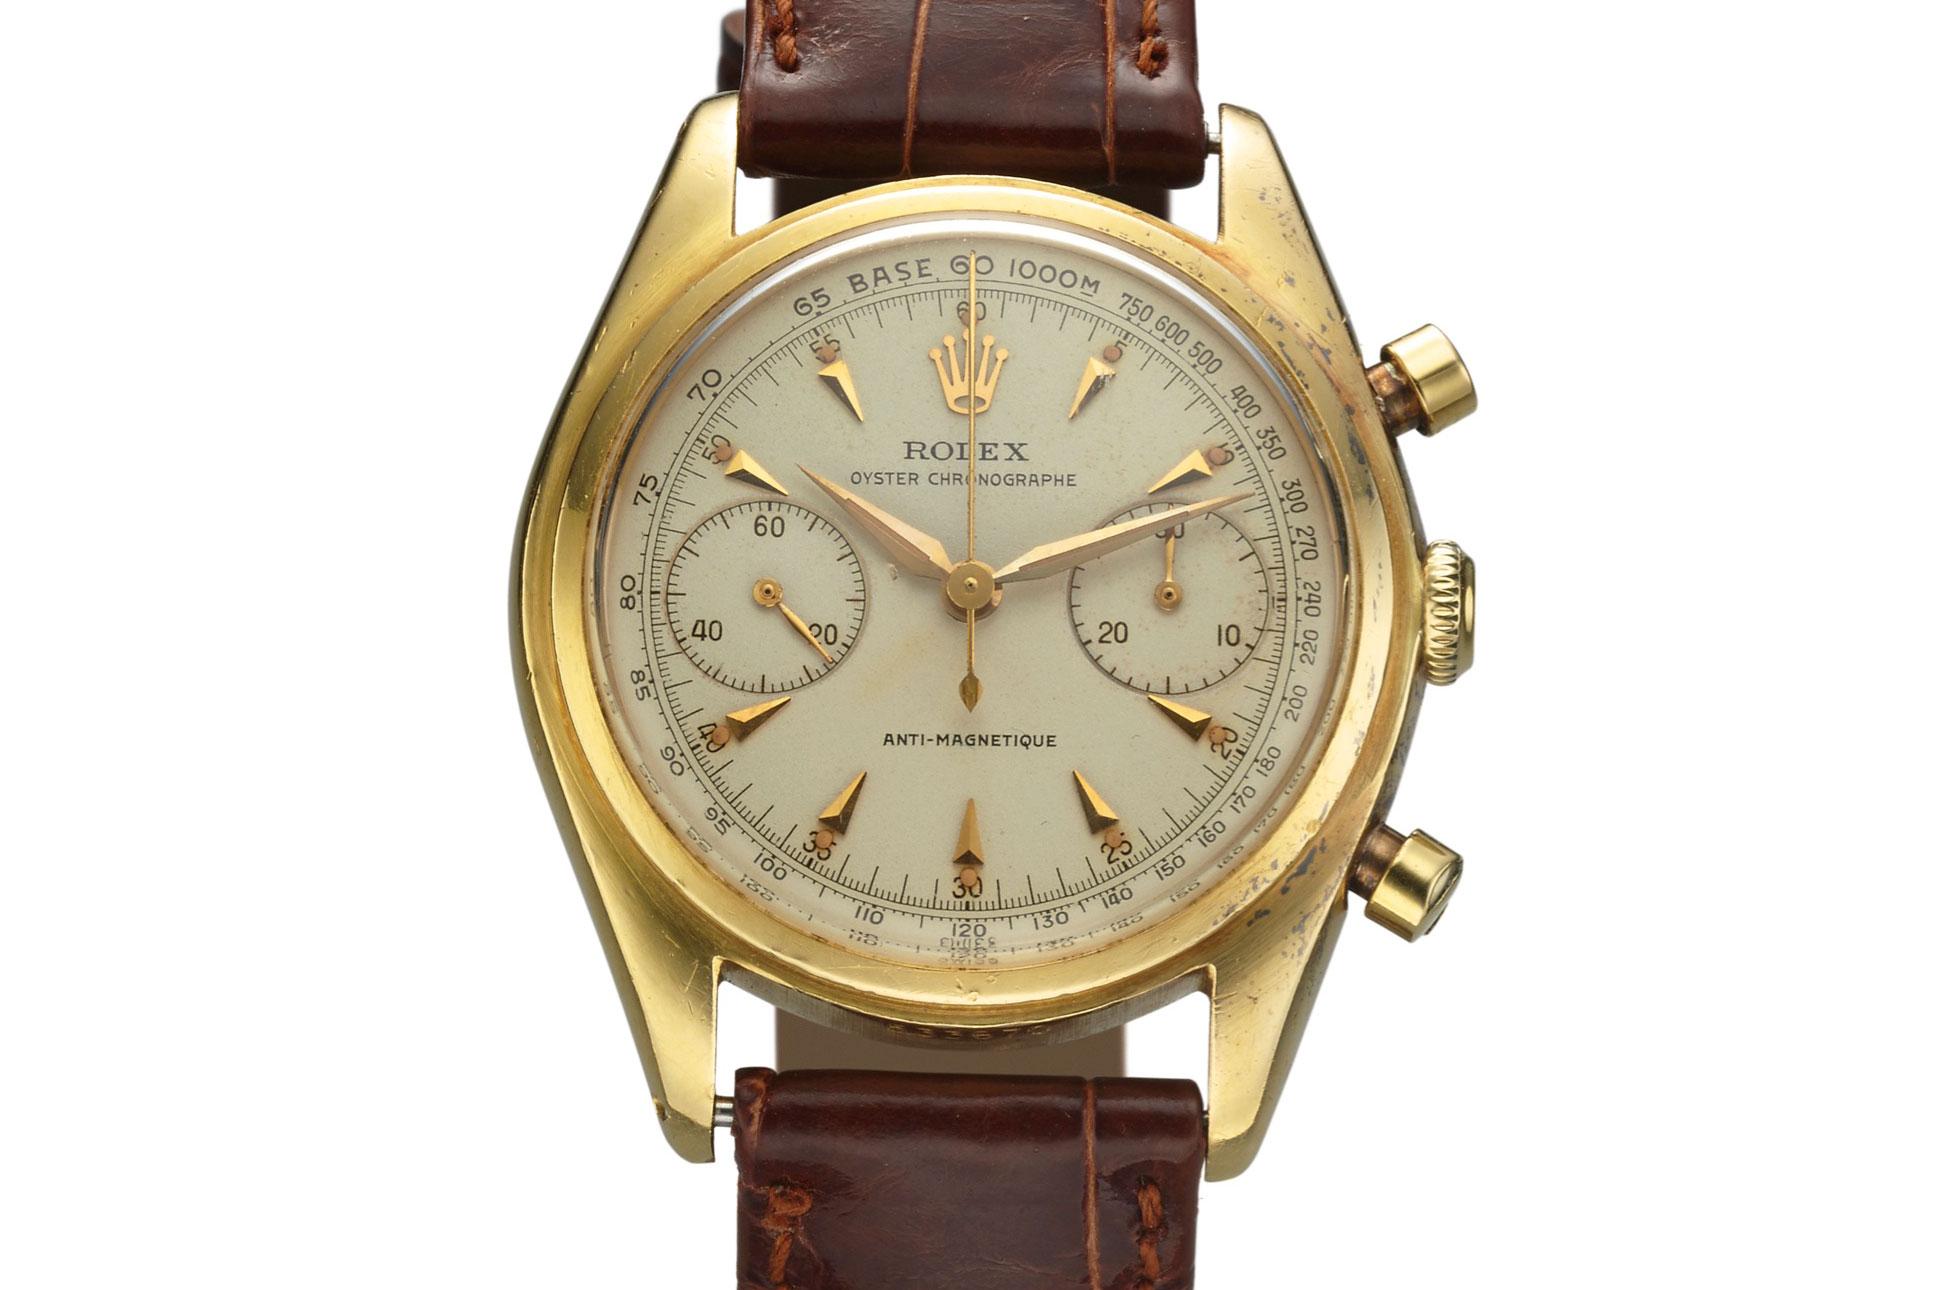 Rolex Ref. 4500 Chronograph (Lot 250)